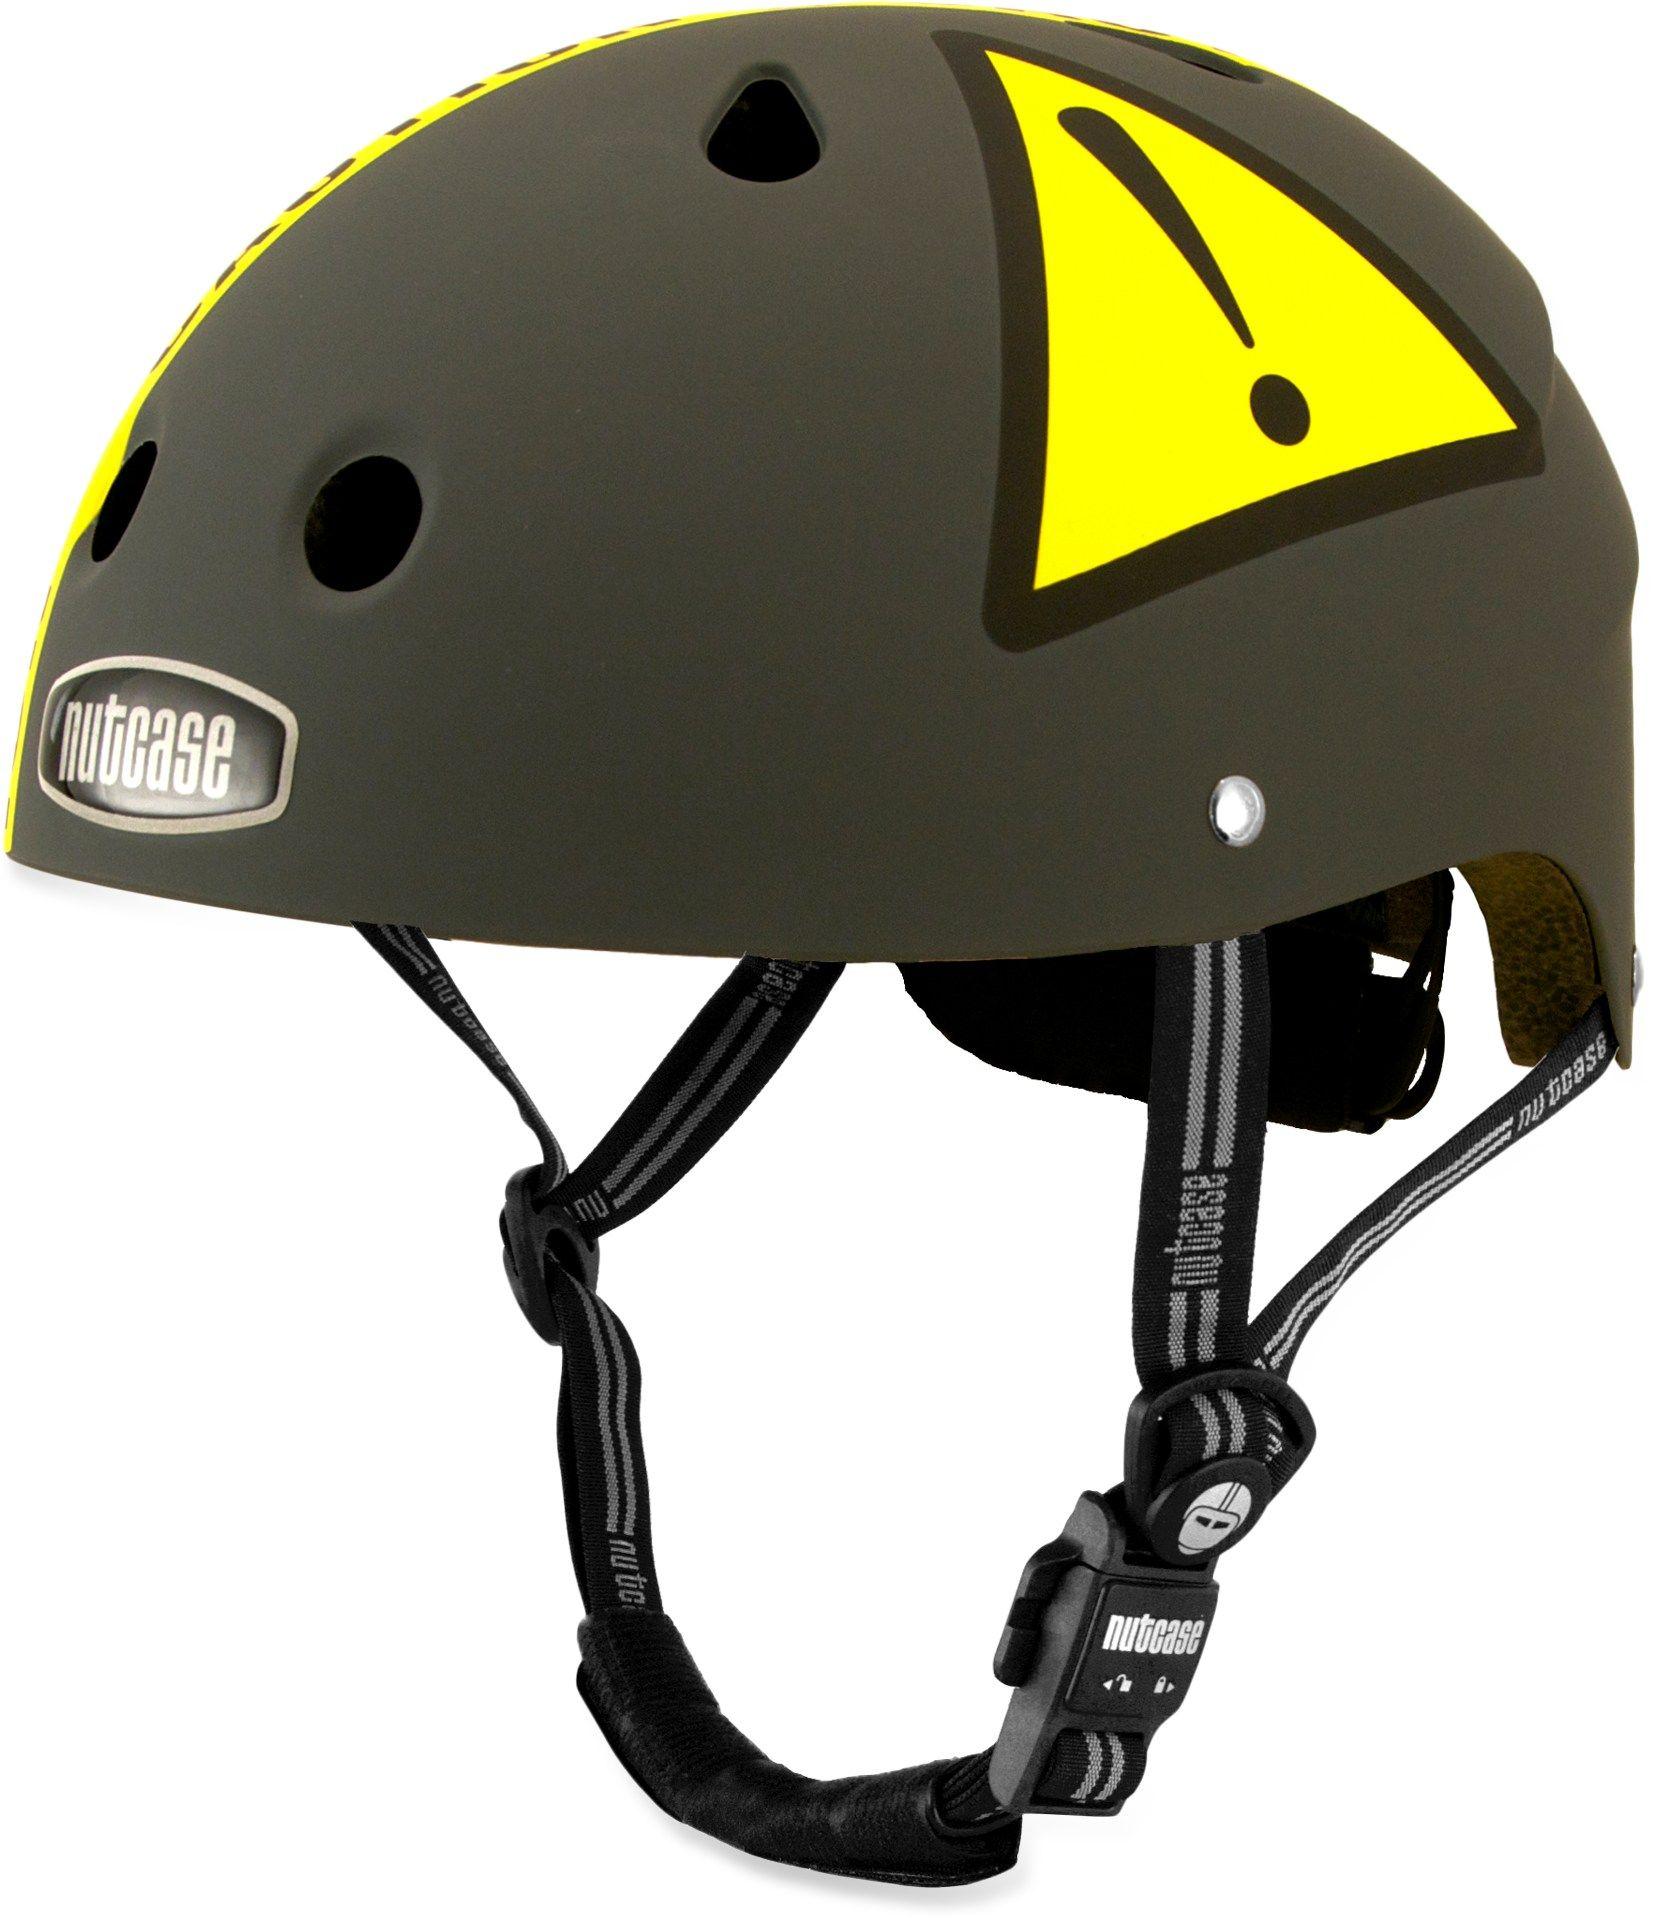 Nutcase Little Nutty Bike Helmet Kids Kids Bike Helmet Bike